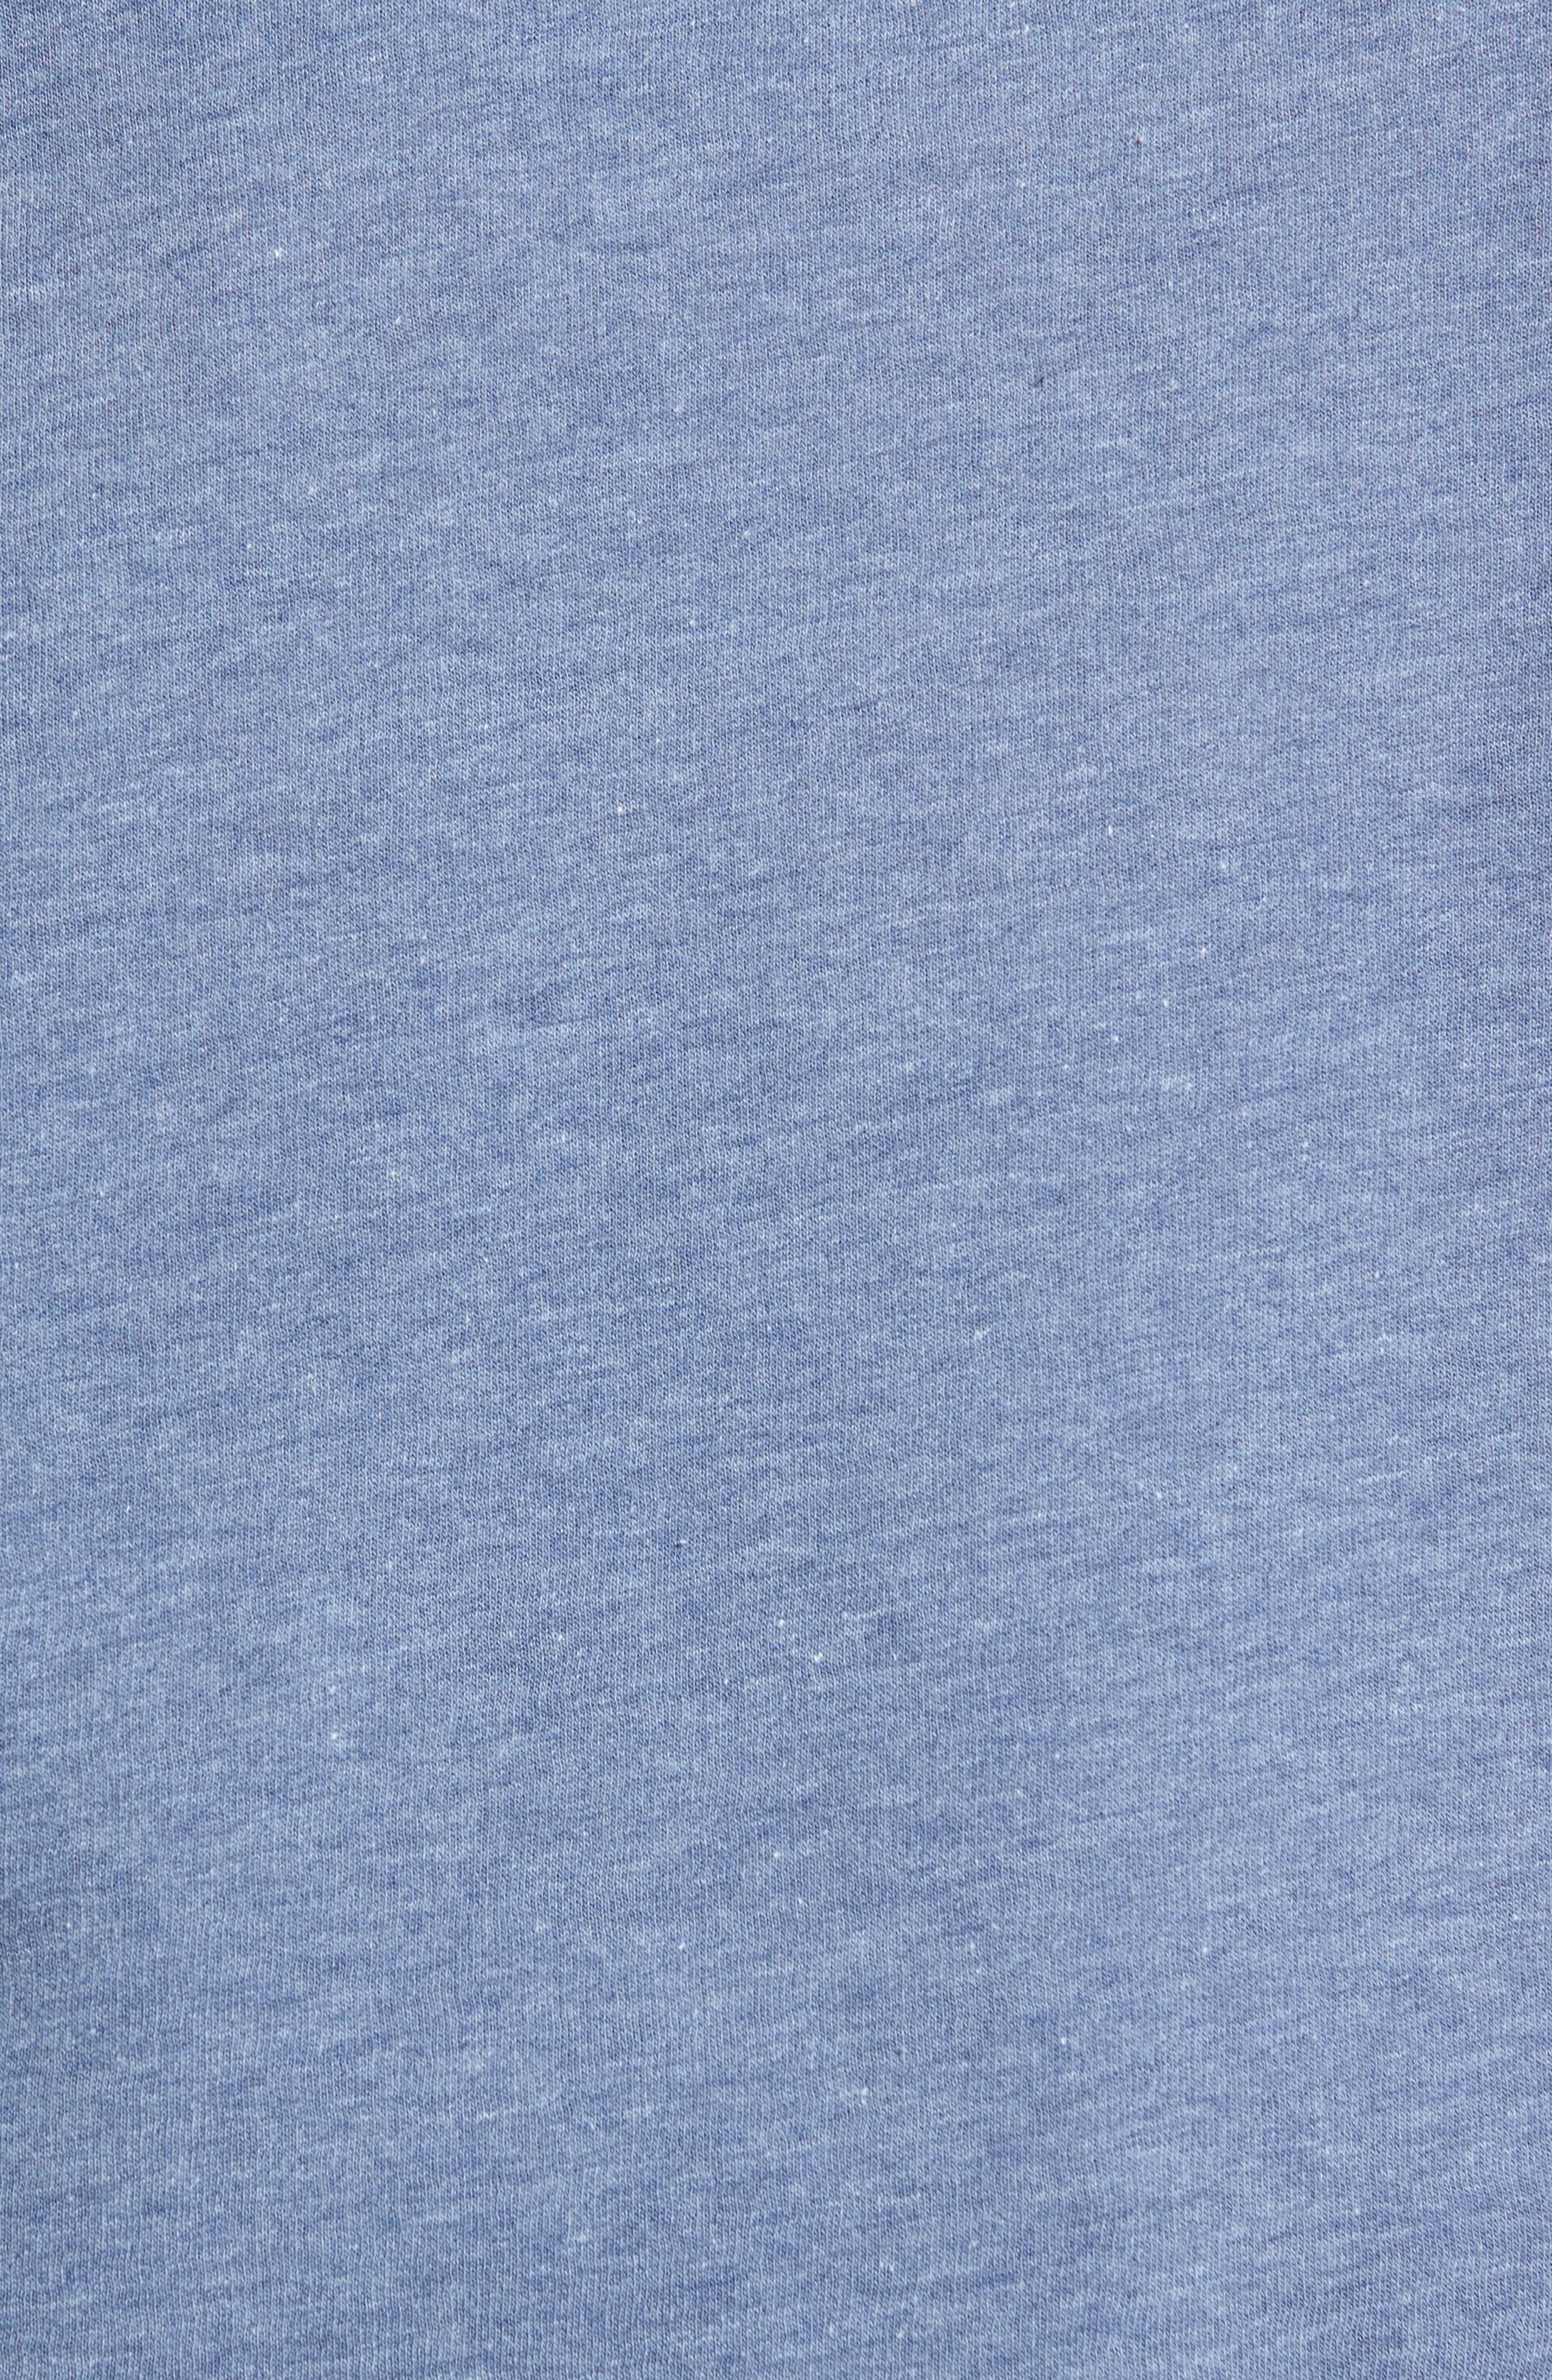 Crewneck Sweatshirt,                             Alternate thumbnail 5, color,                             Blue Insignia Treasure